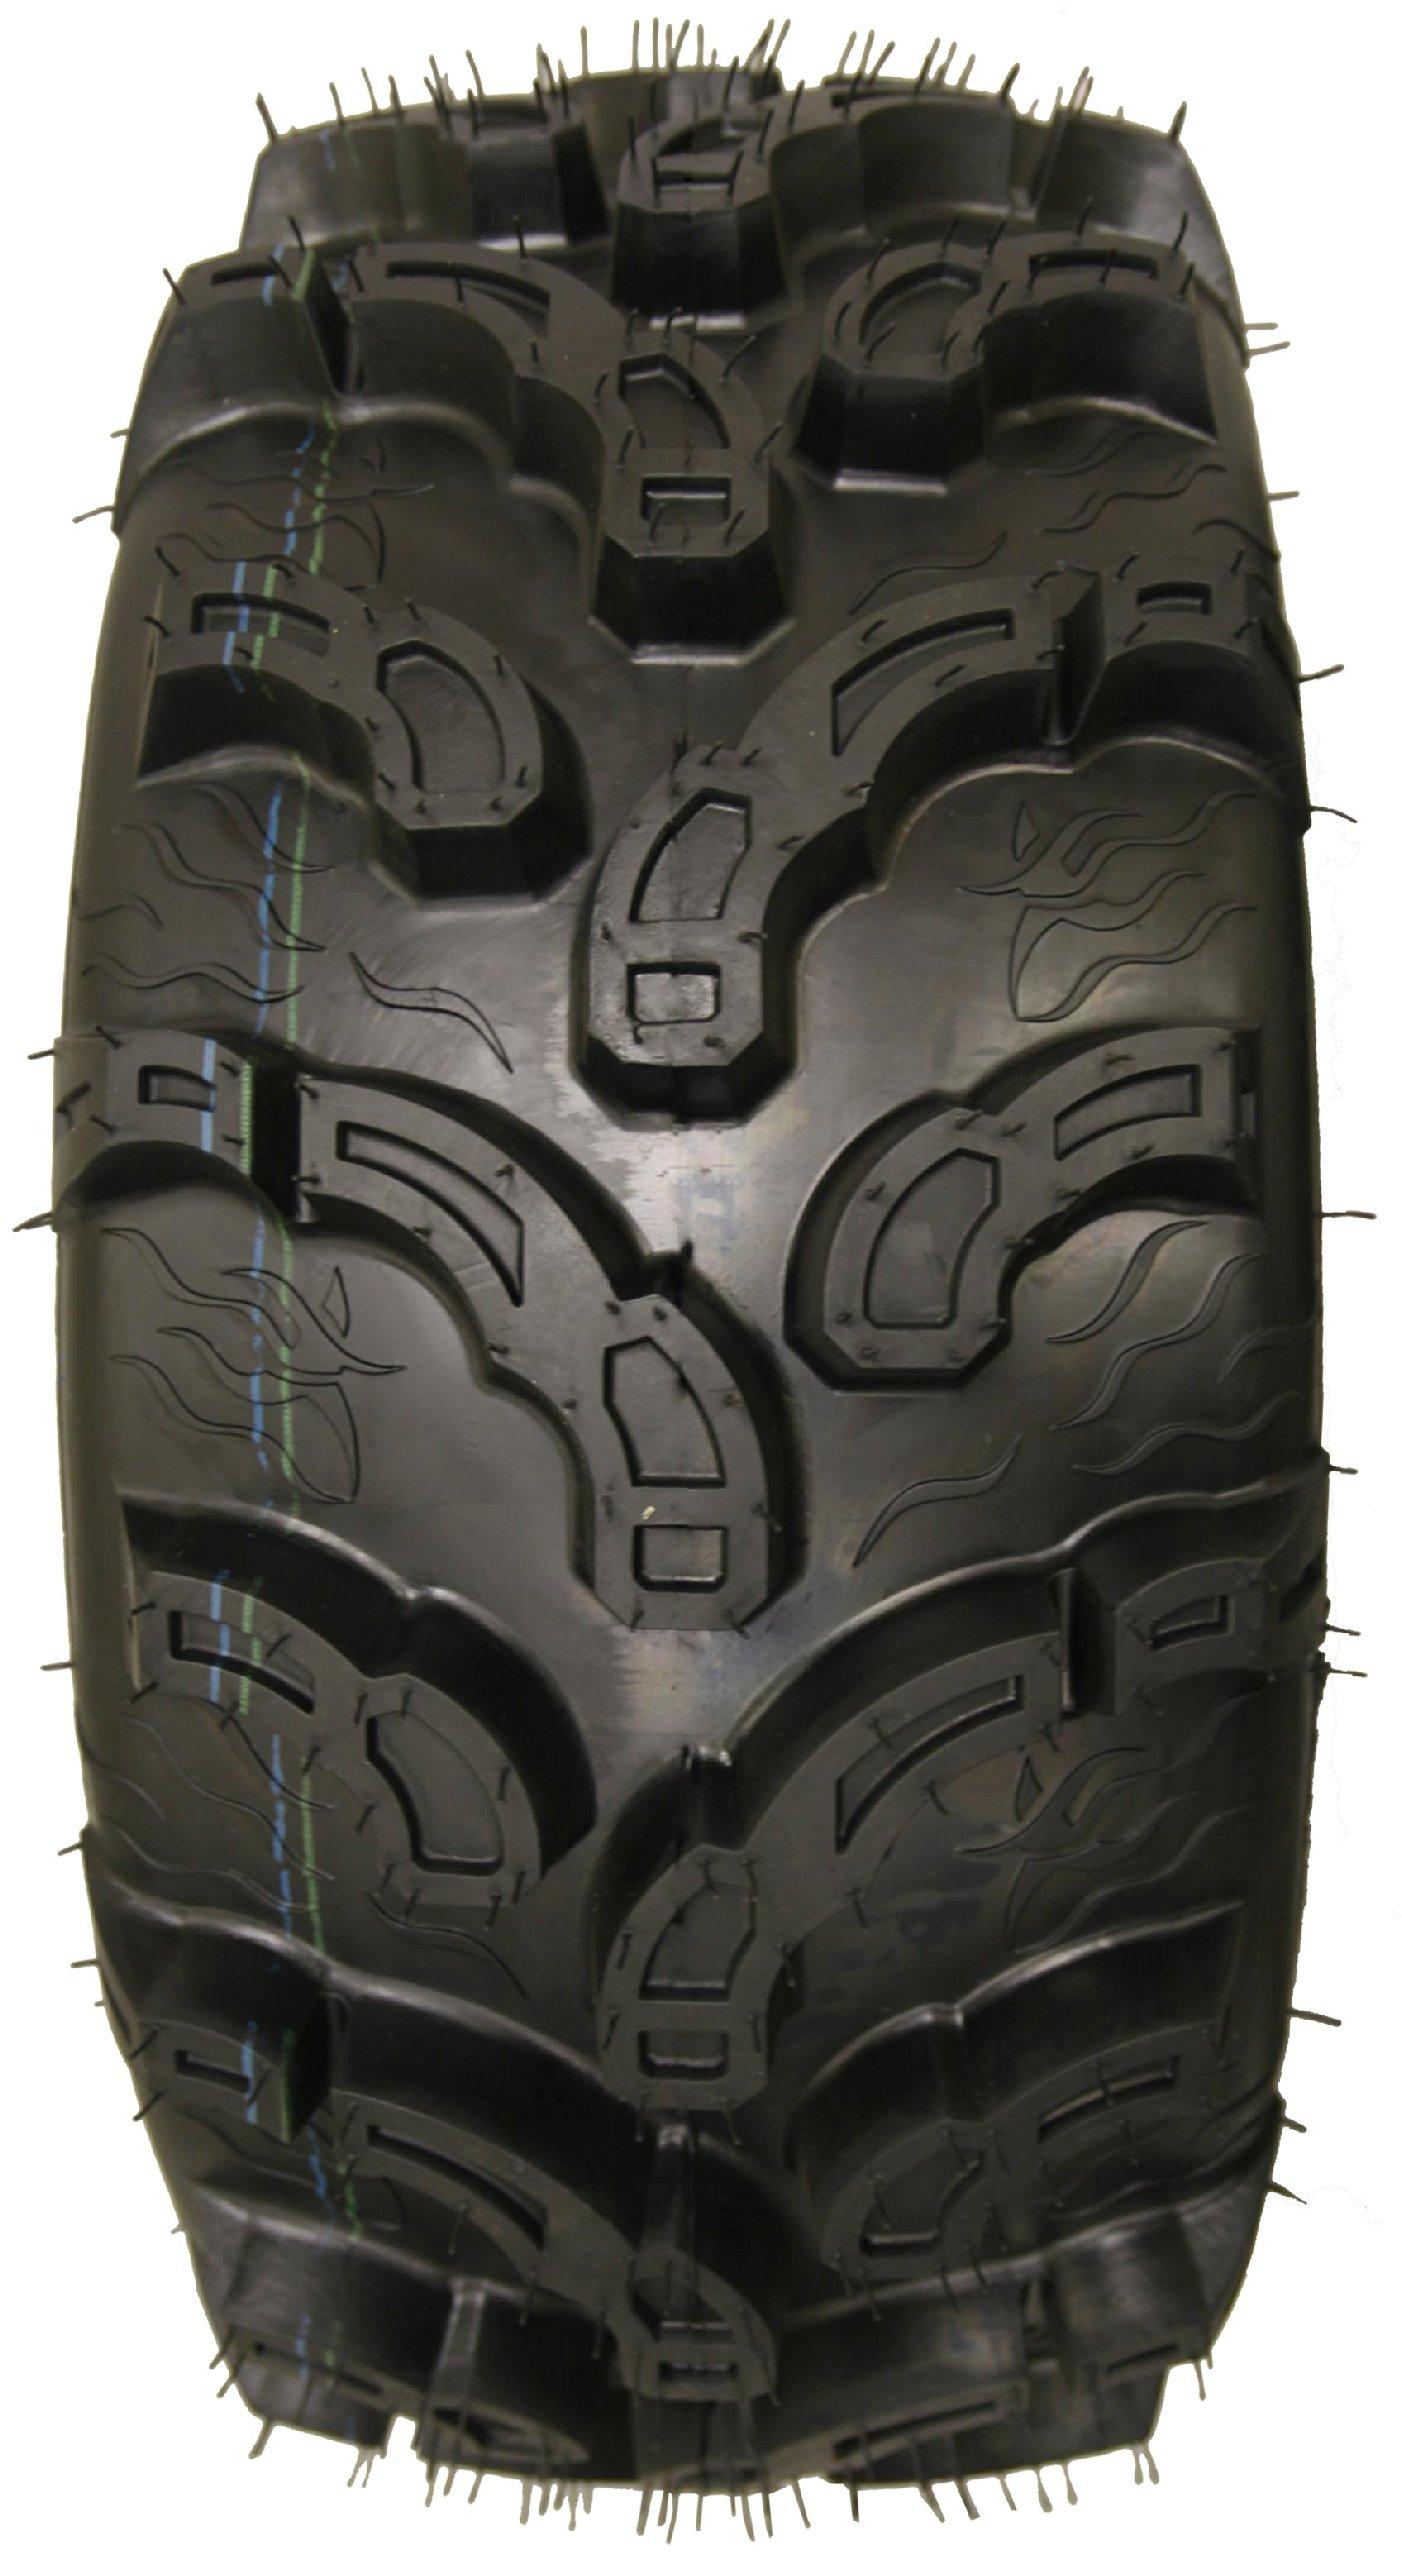 Set of 4 New Premium WANDA ATV/UTV Tires 27x9-12 Front & 27x12-12 Rear /6PR P375 10219/10220 by Wanda (Image #3)